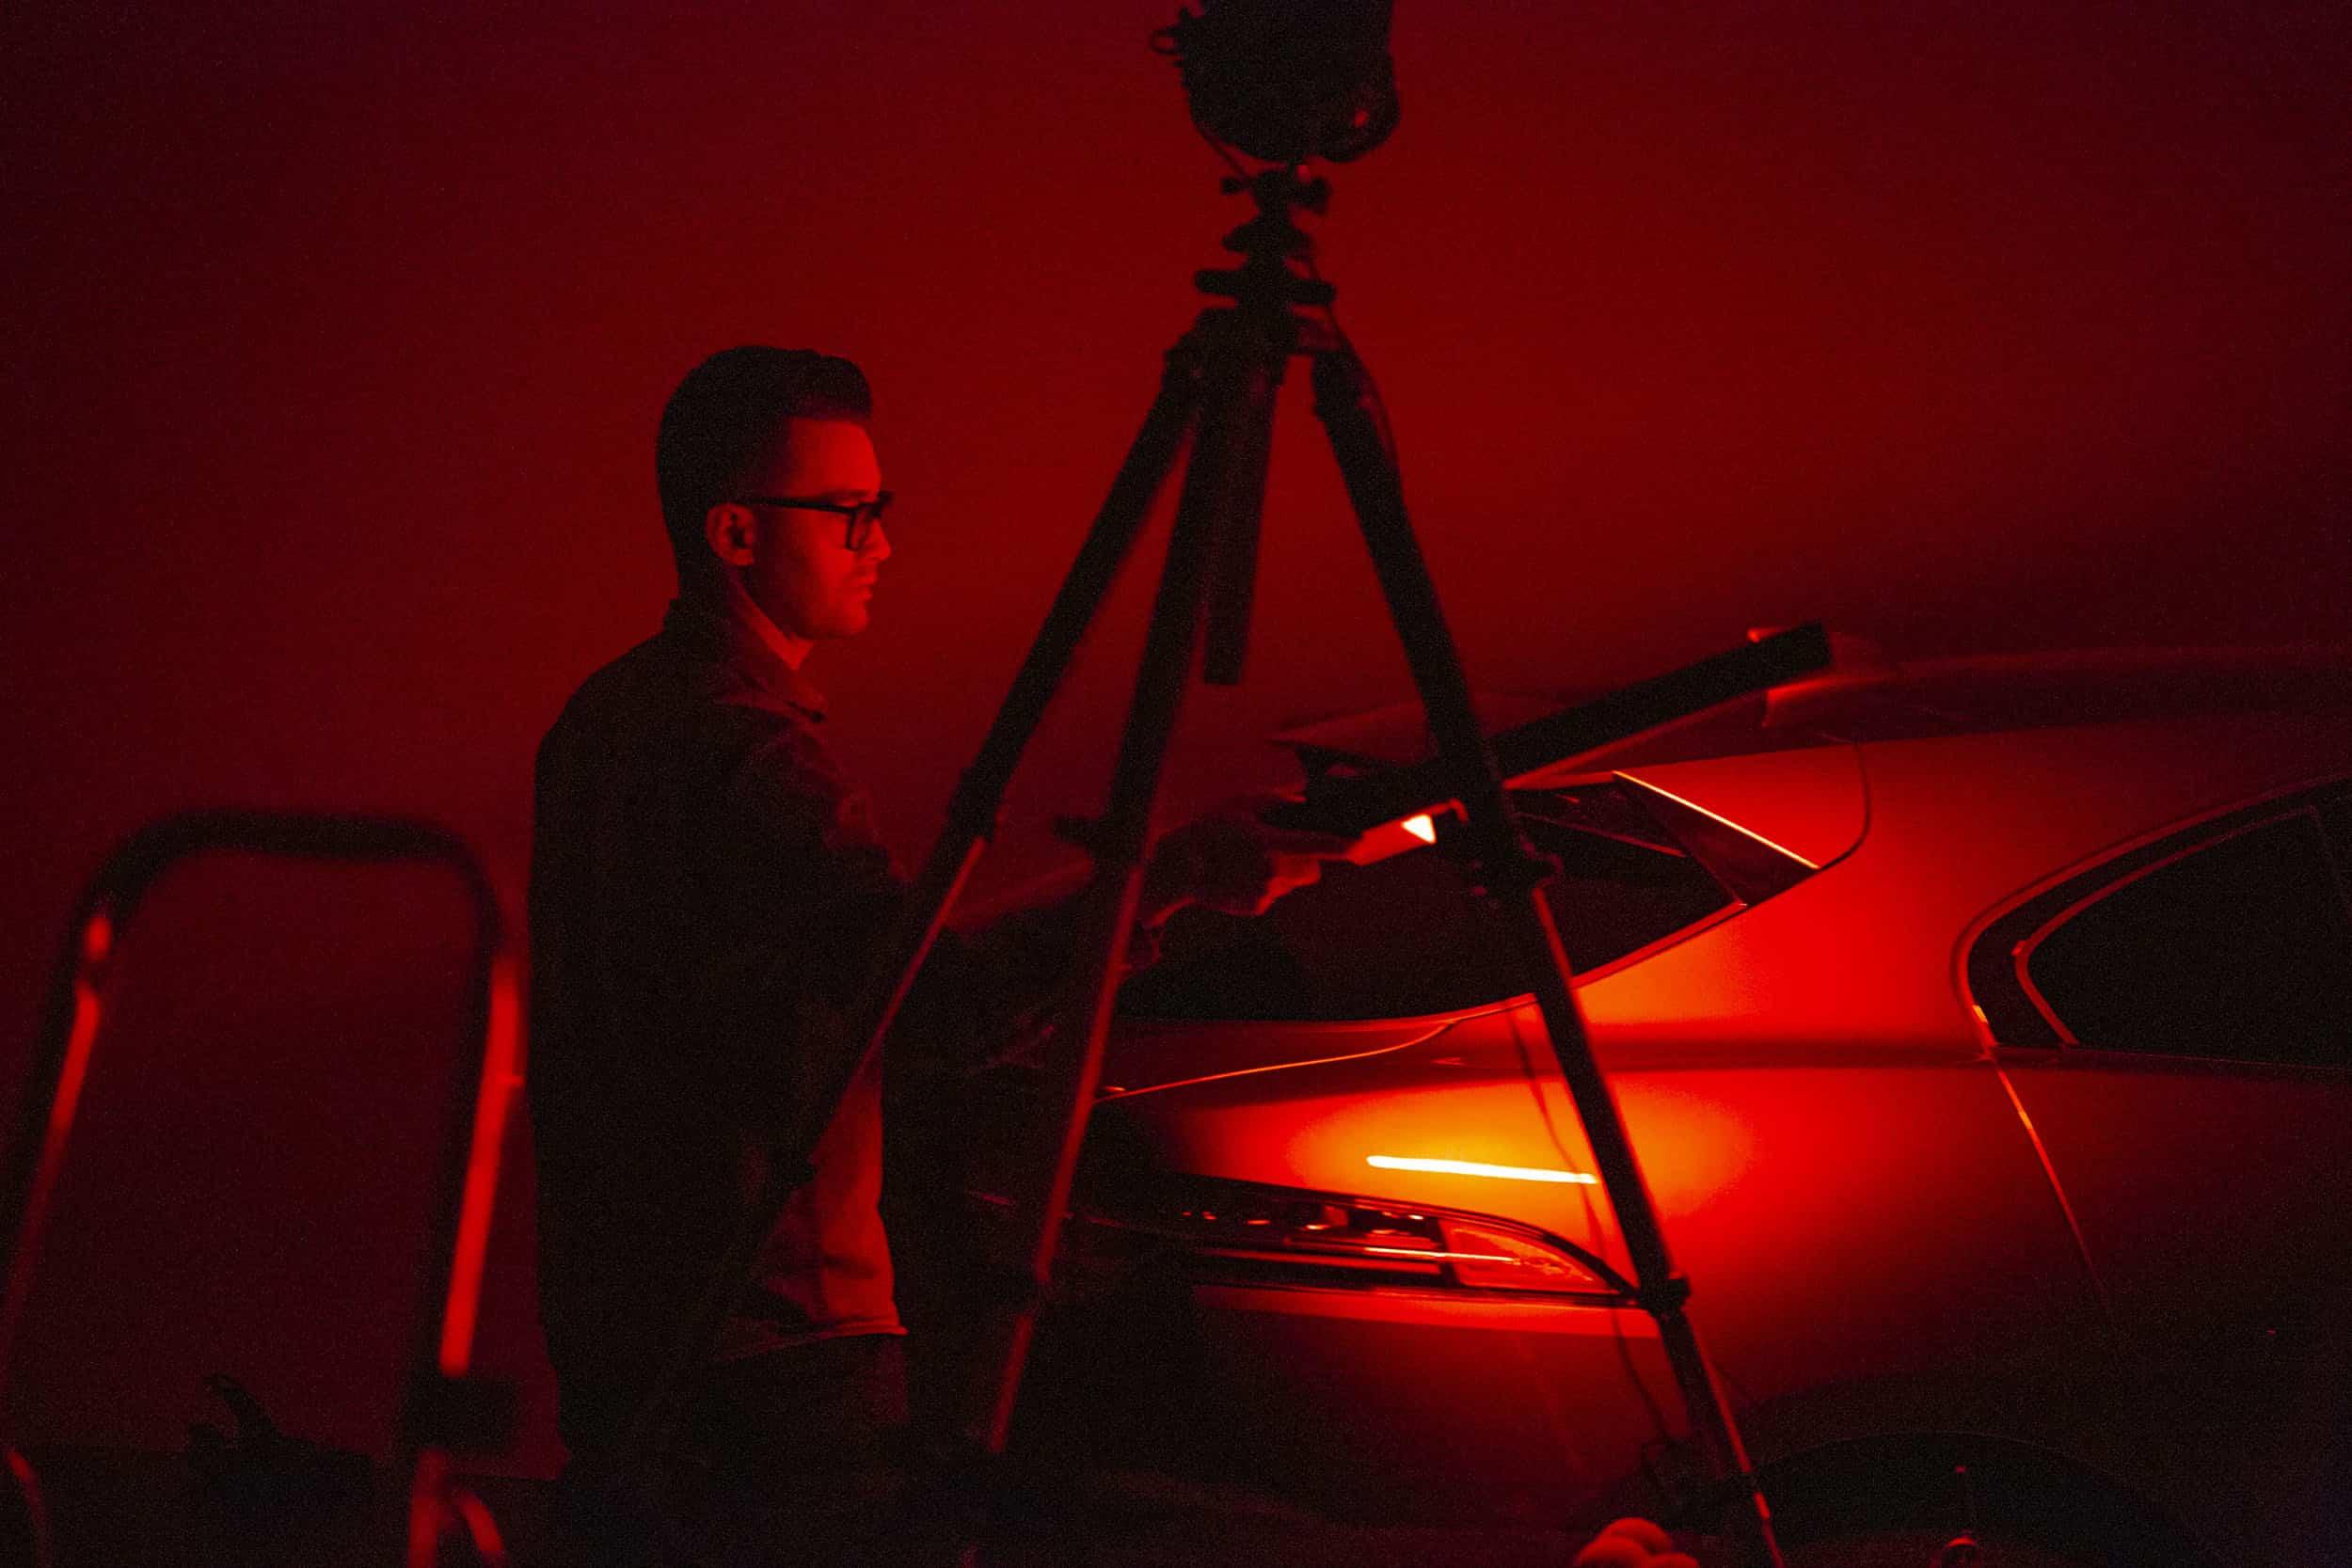 studio-ignatov-wkw-automotive-imagekampagne-makingof-11